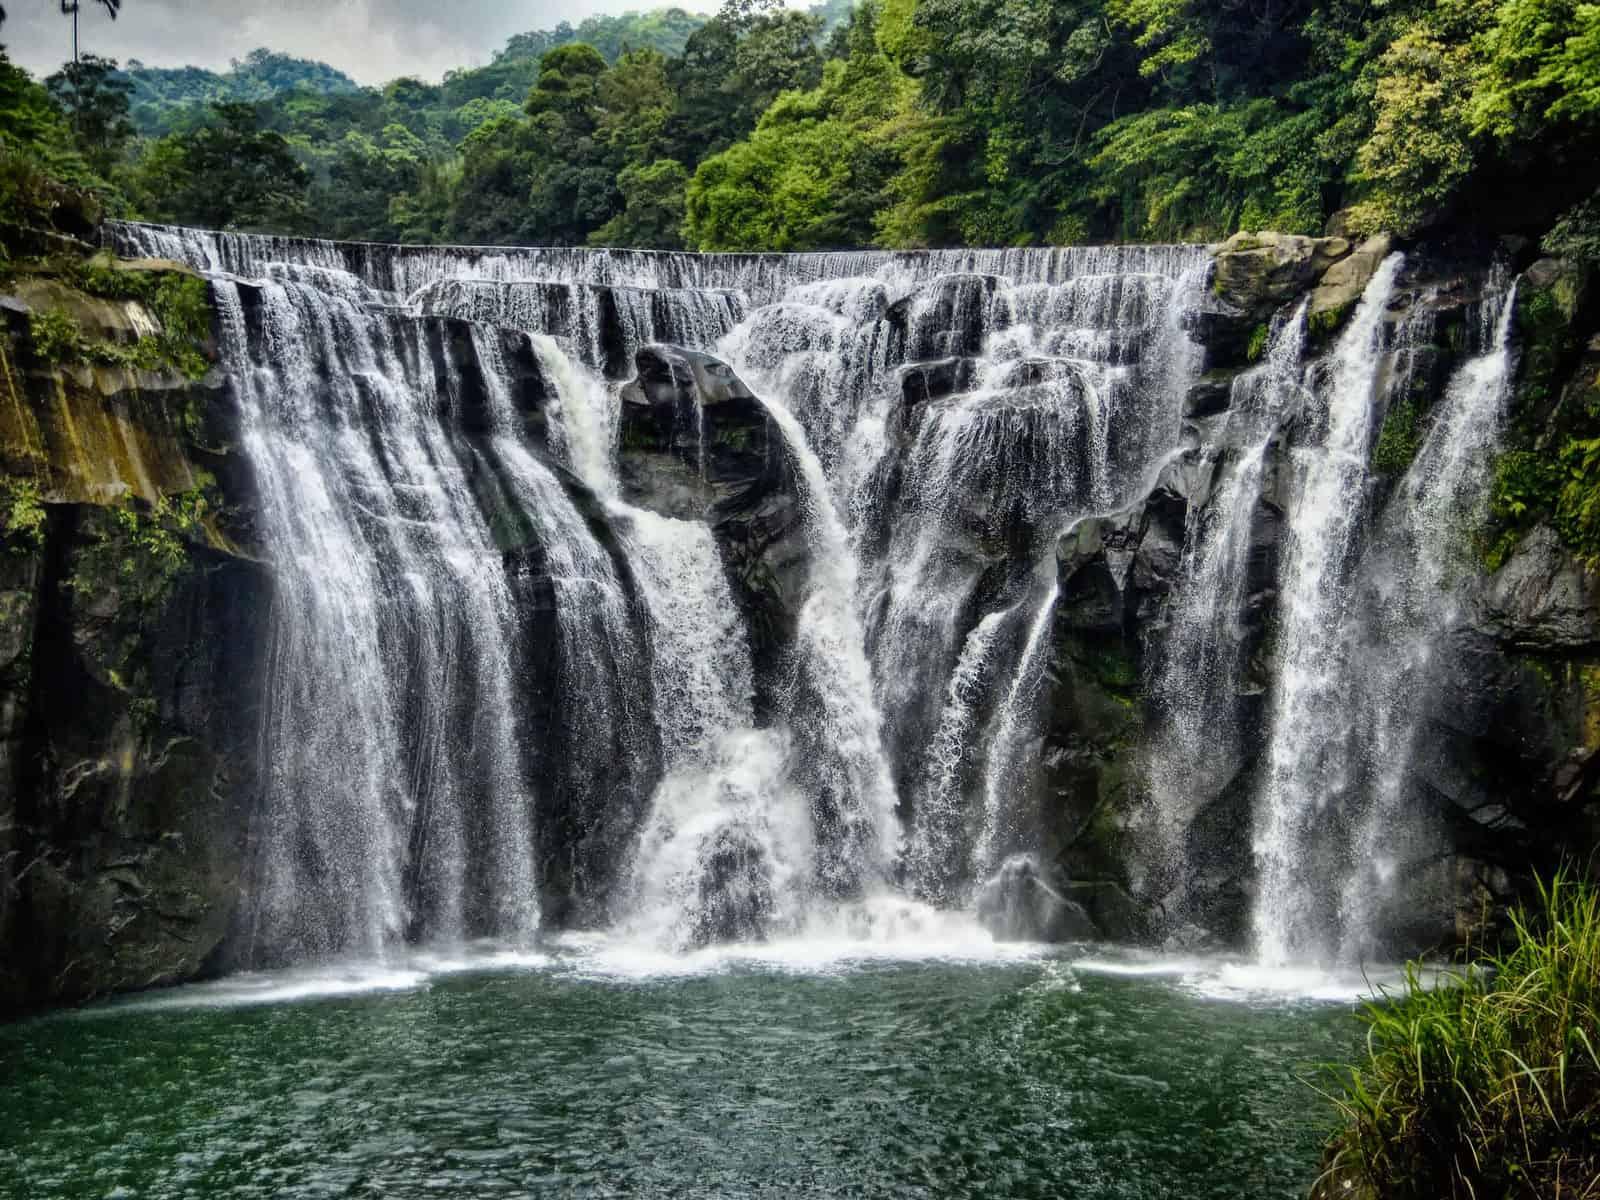 Shifen Waterfall in Shifen, Taiwan